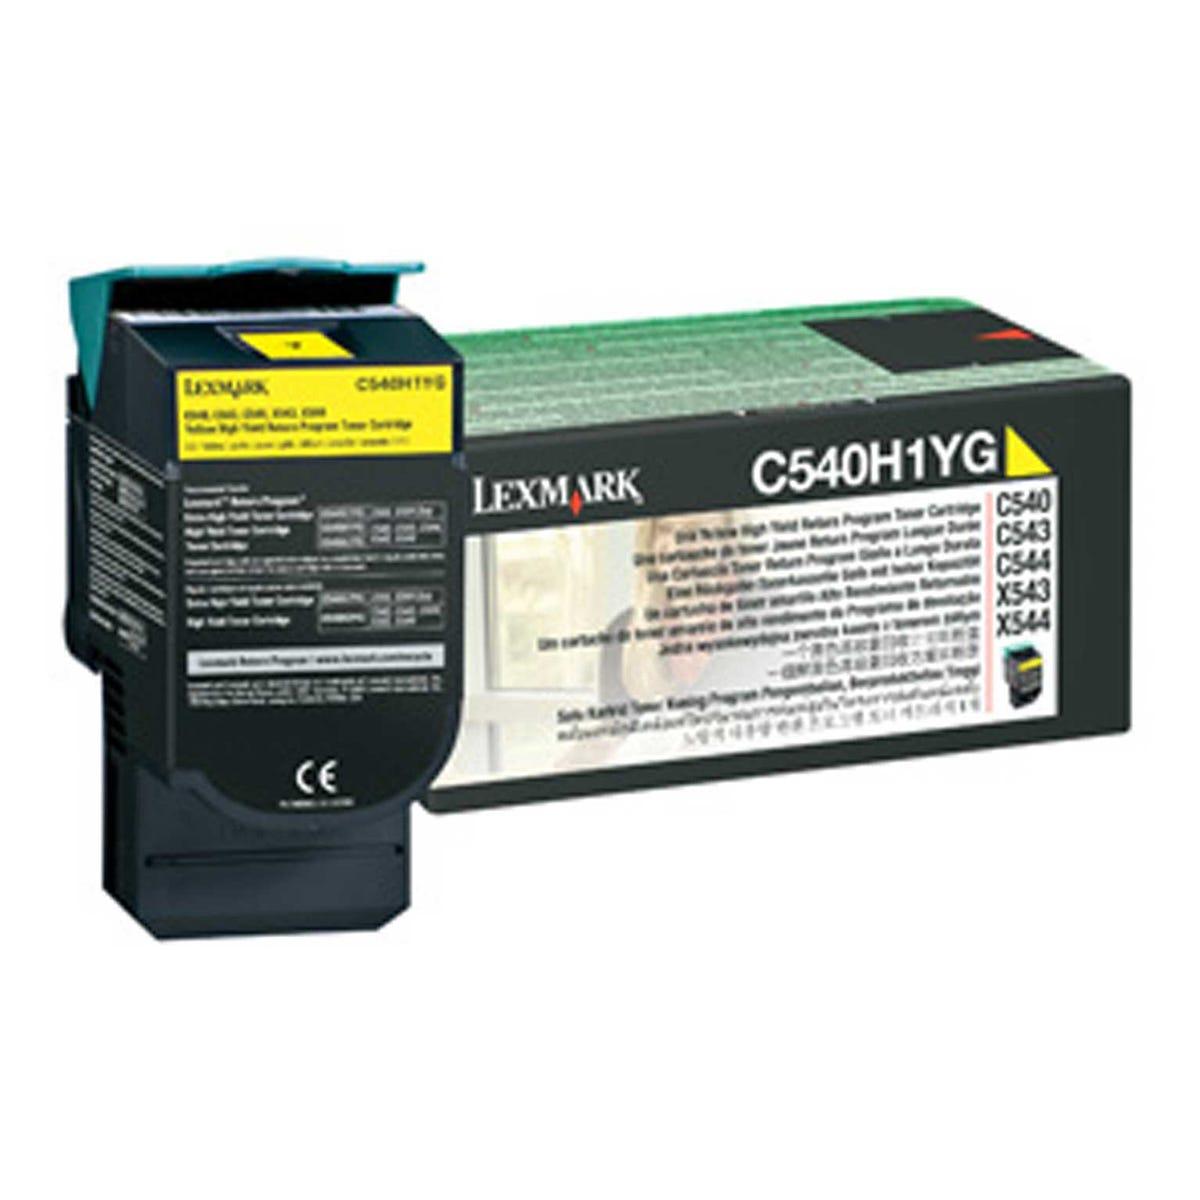 Image of Lexmark OC540H1YG High Yield Return Toner, Yellow